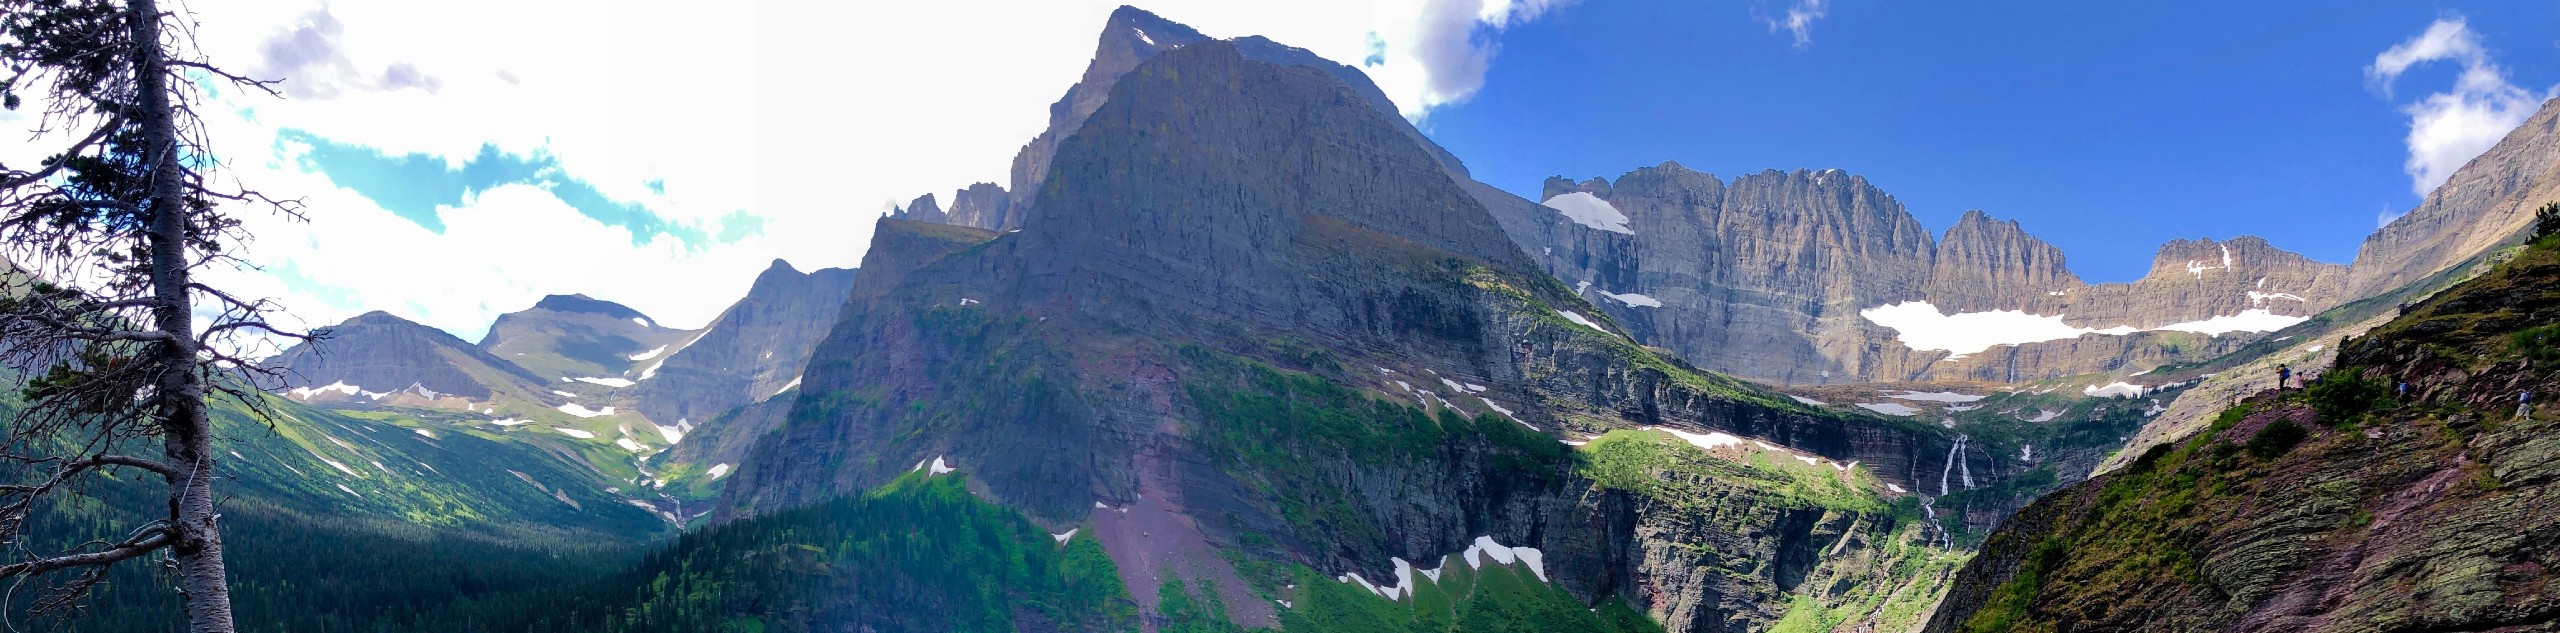 Ginnell Glacier trail in Glacier National Park